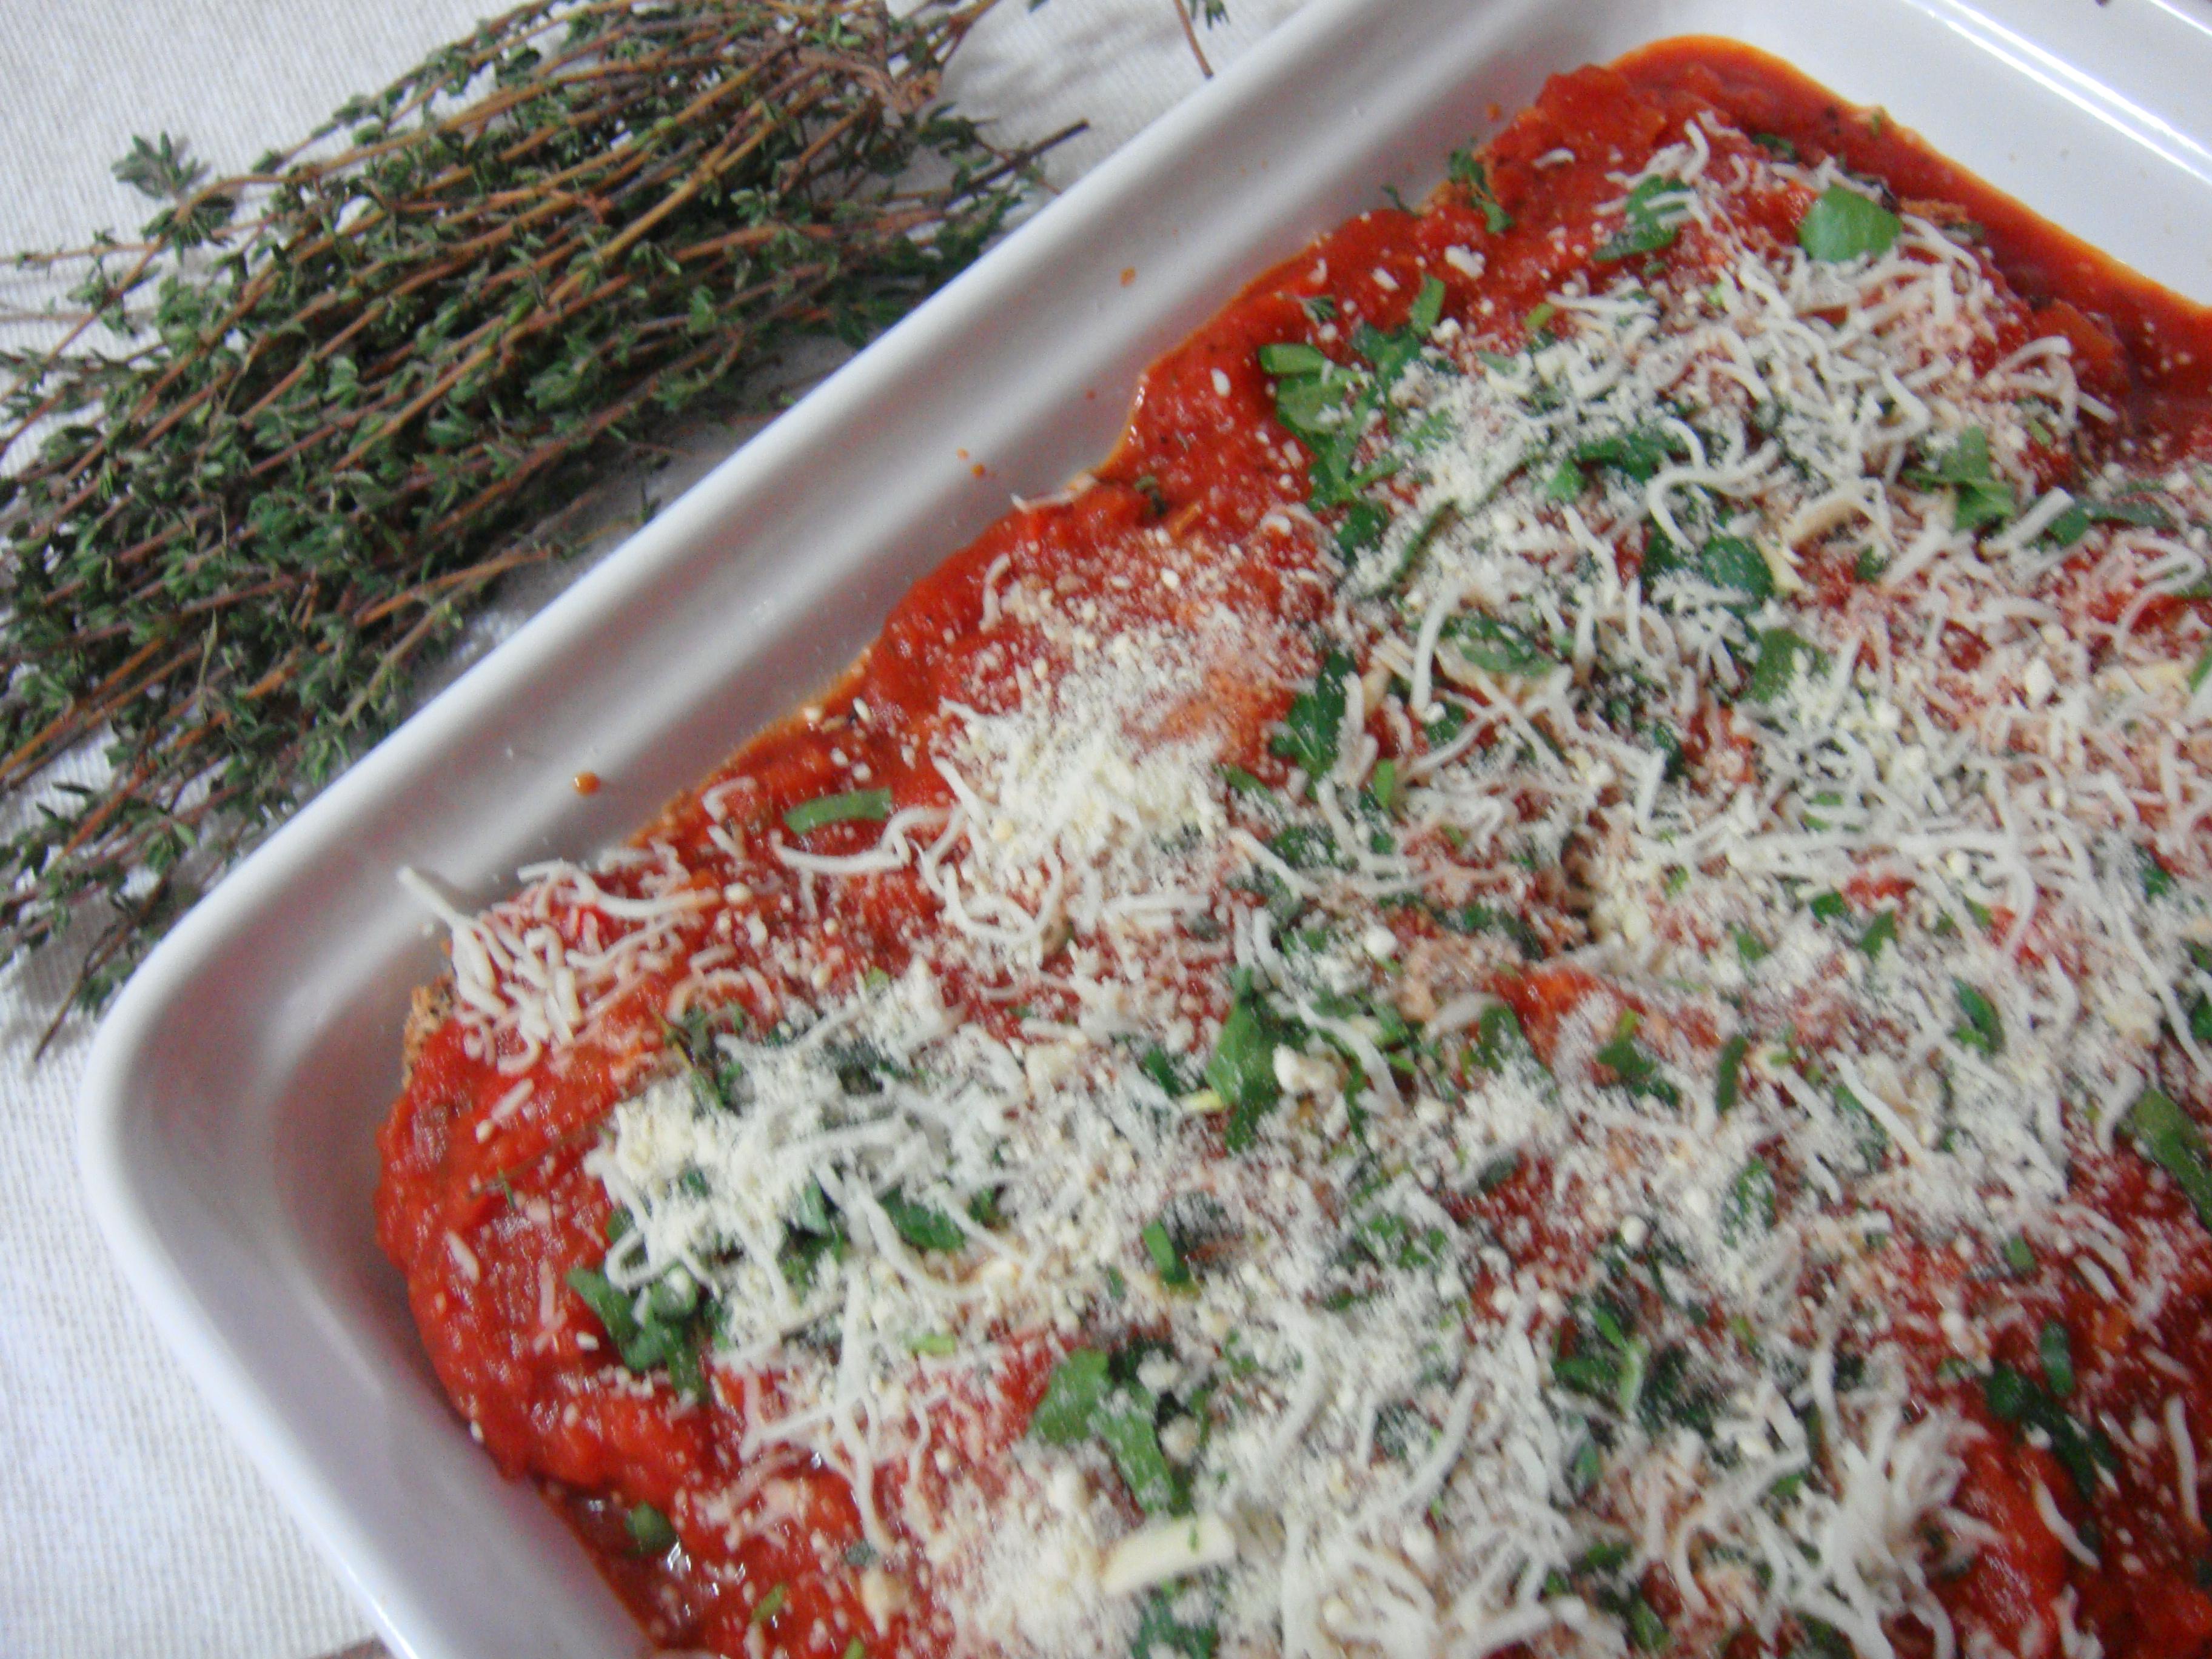 Eggplant Parmigiana Olive Garden Style Anubhavati Tastes From My Kitchen